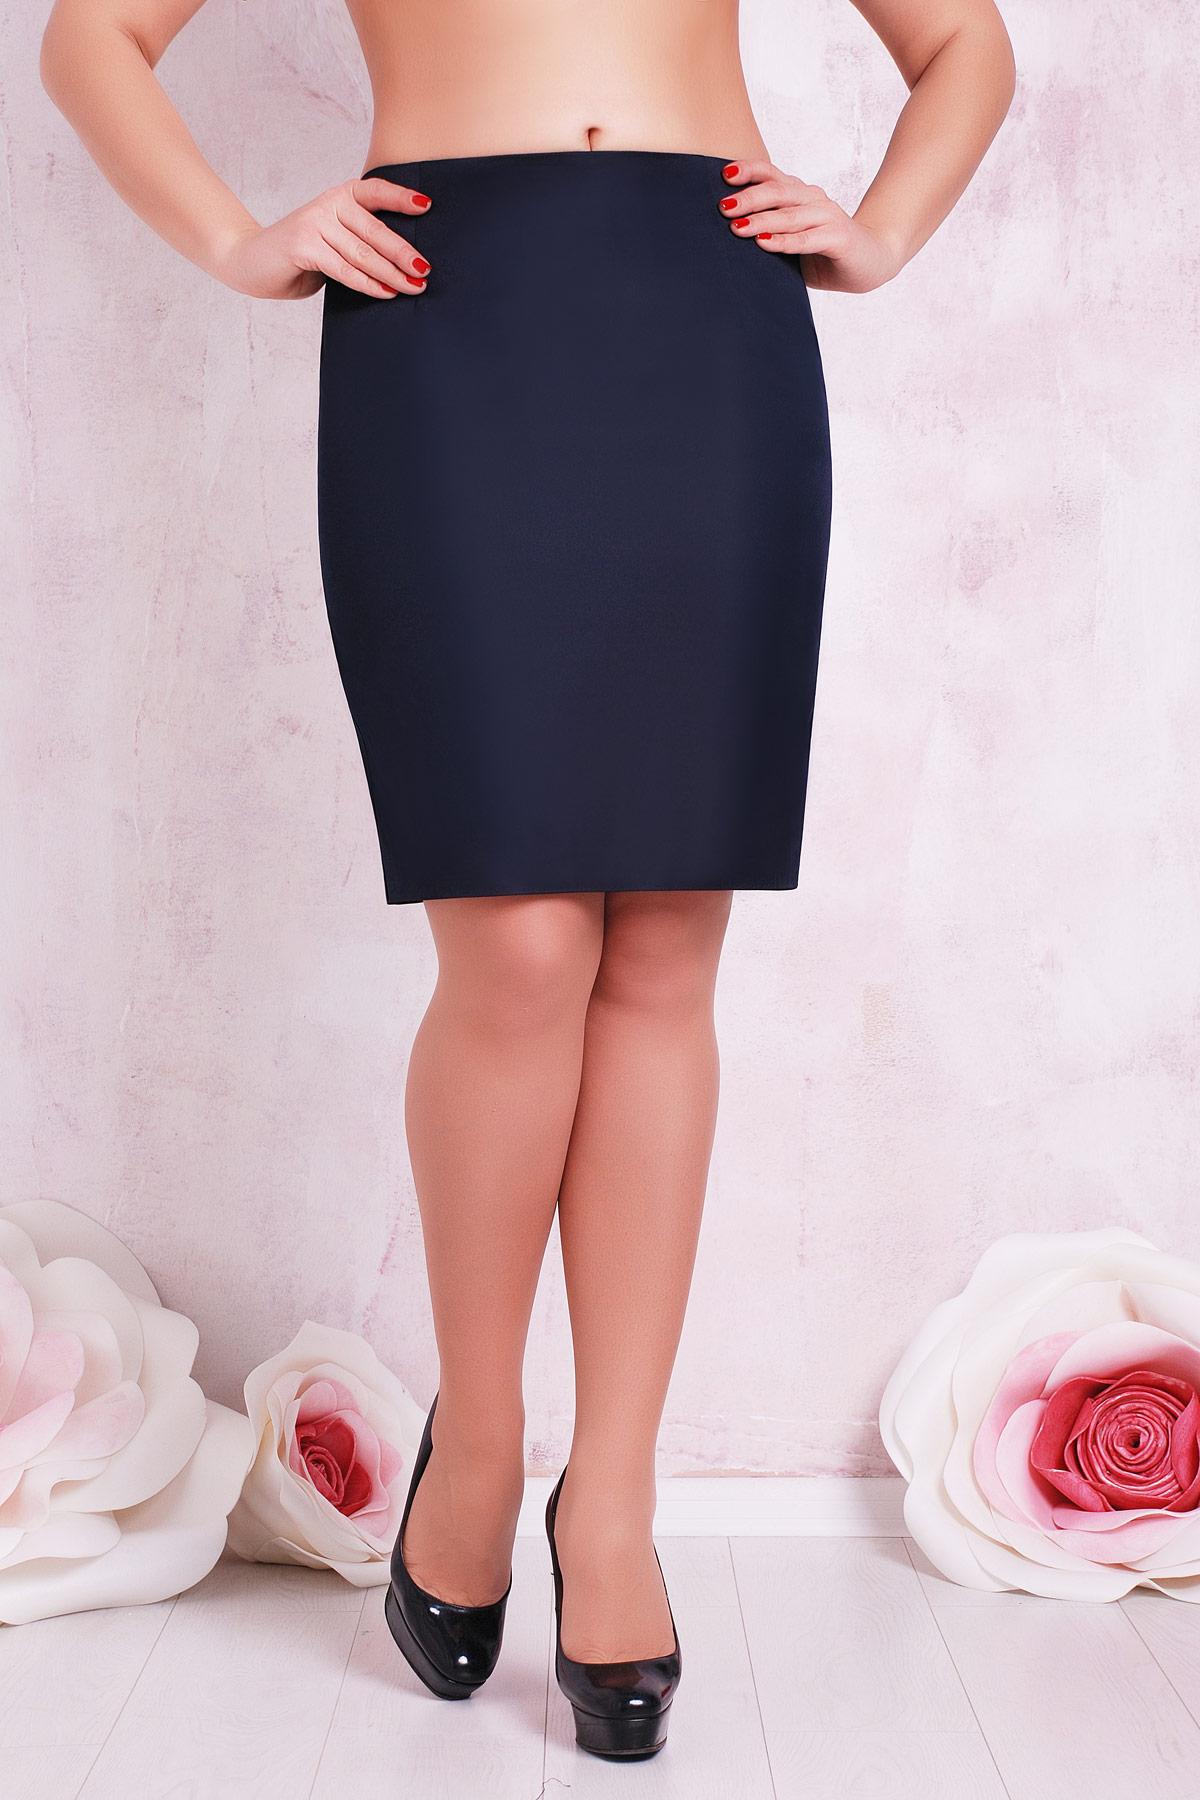 прямая юбка батал темно-синего цвета. юбка мод. №1 Б. Цвет: темно синий